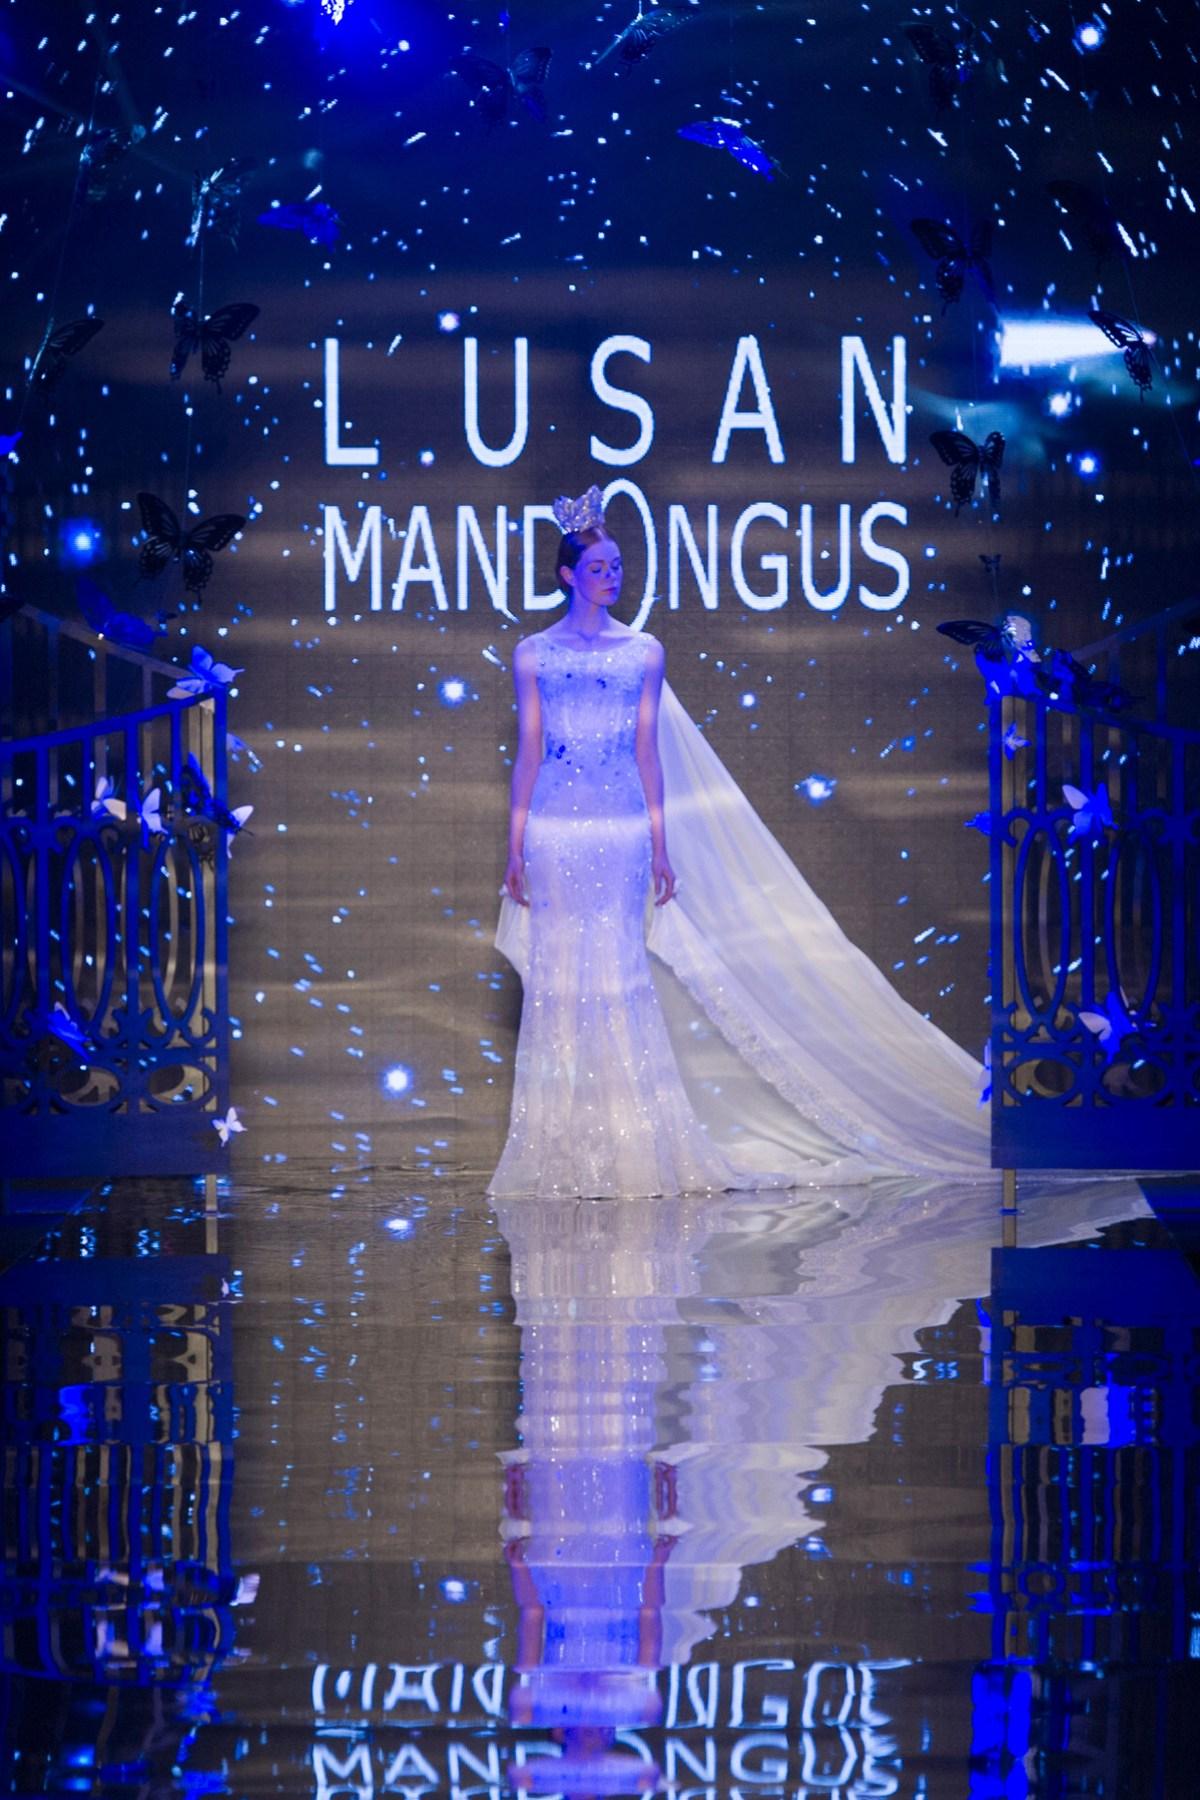 Lusan Mandongus brd RS17 0005